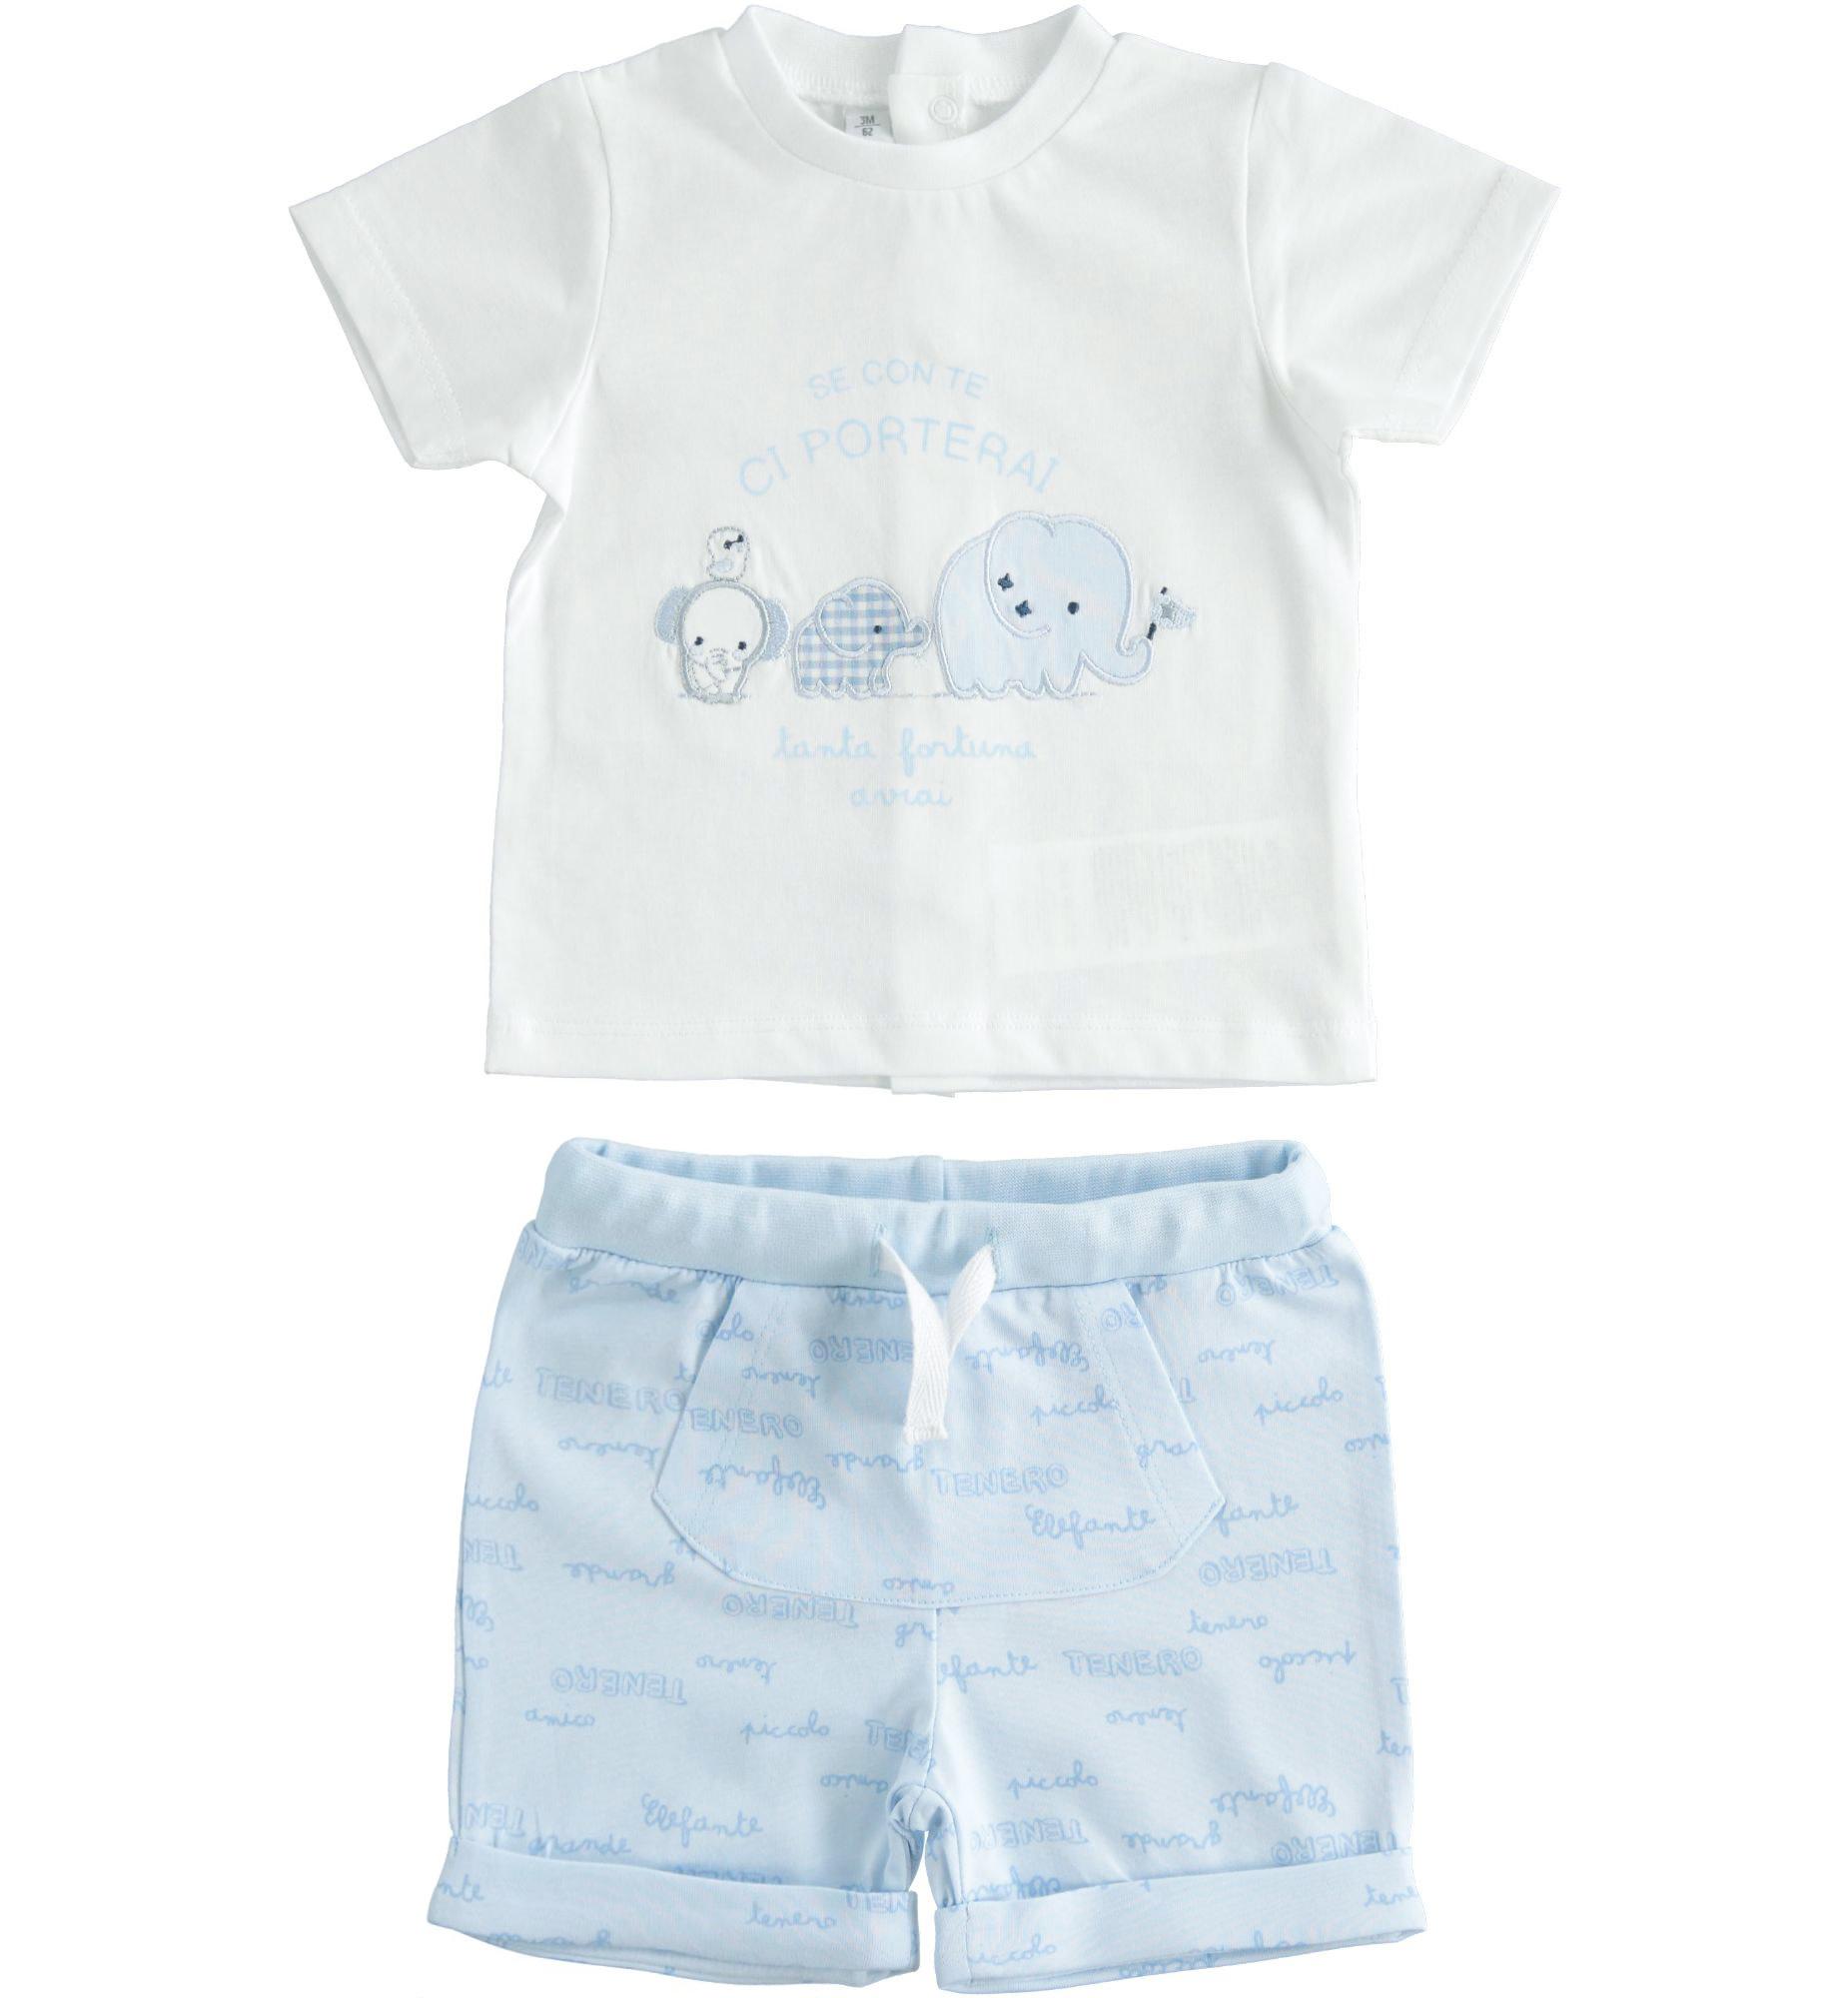 Ido Ido Pale Blue & White Elephant Short Set